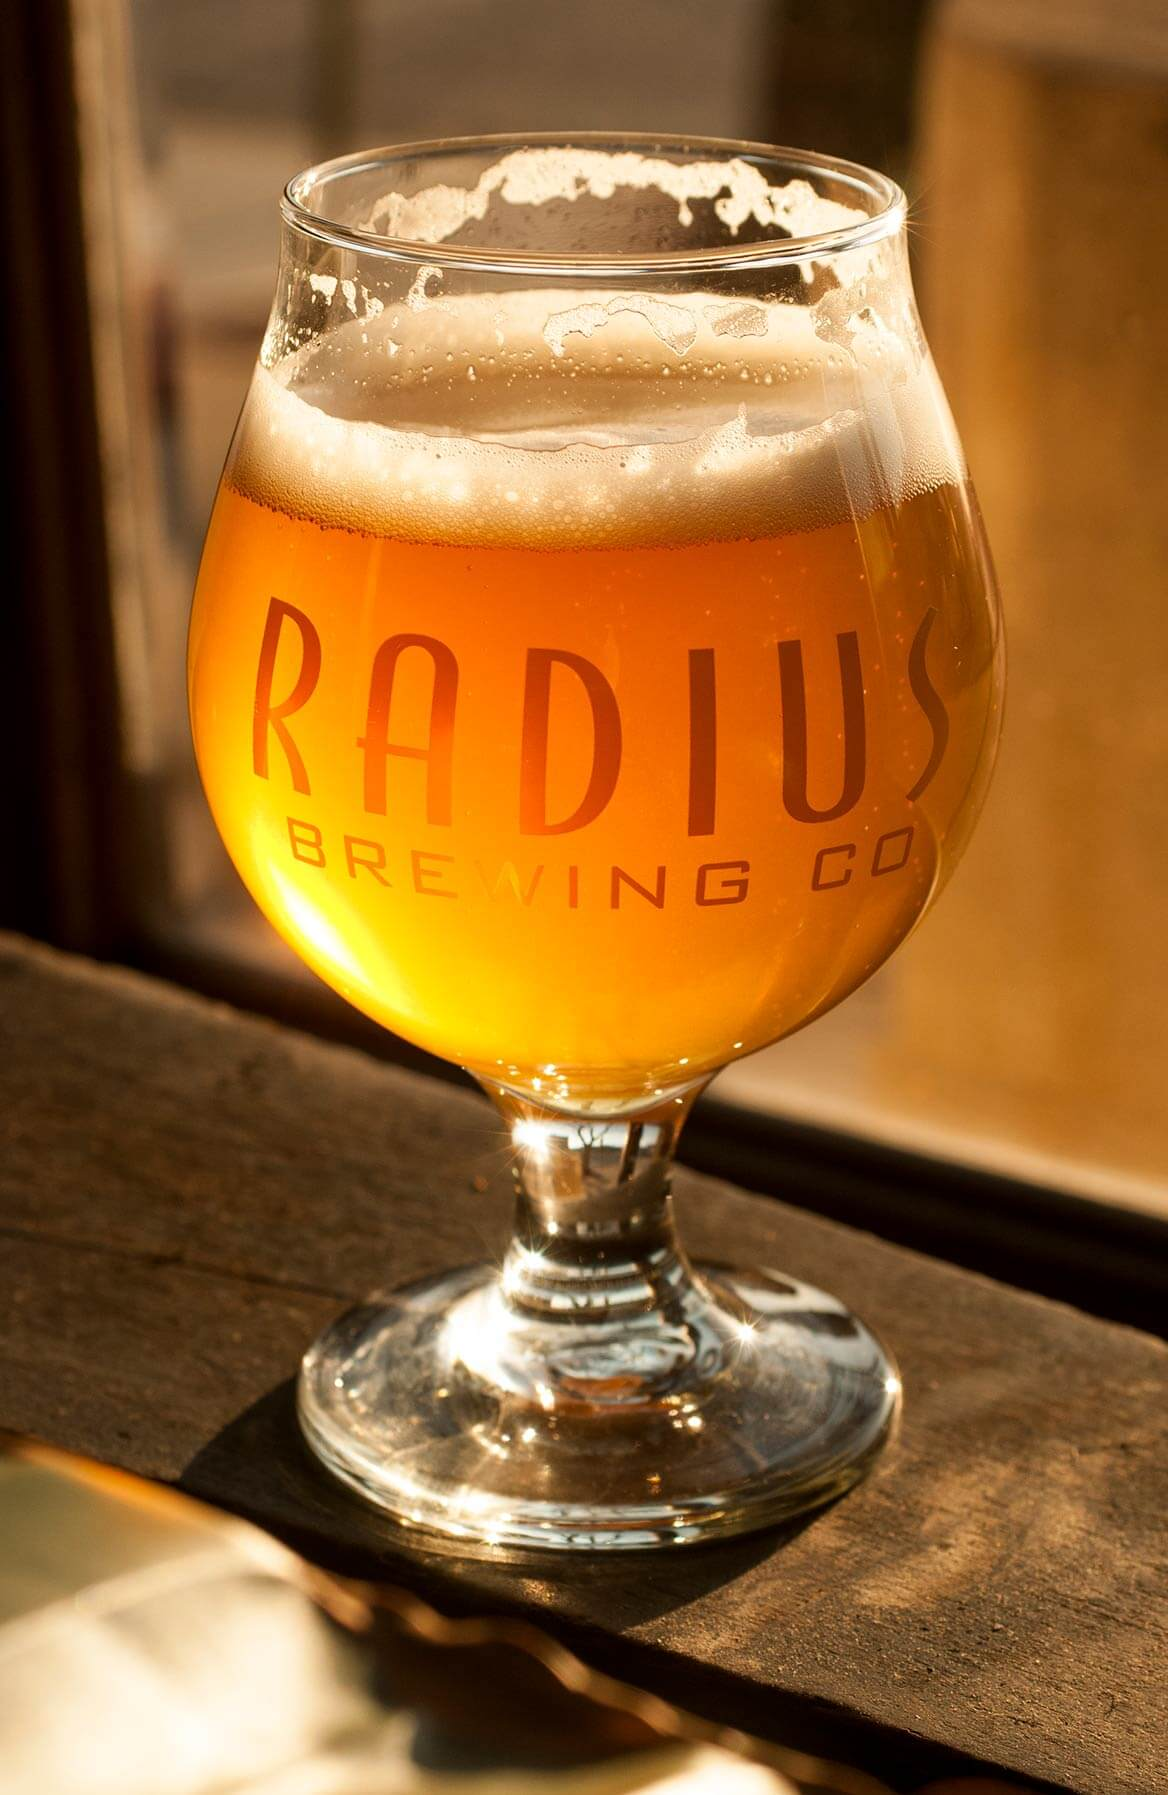 craft beer from radius brewing